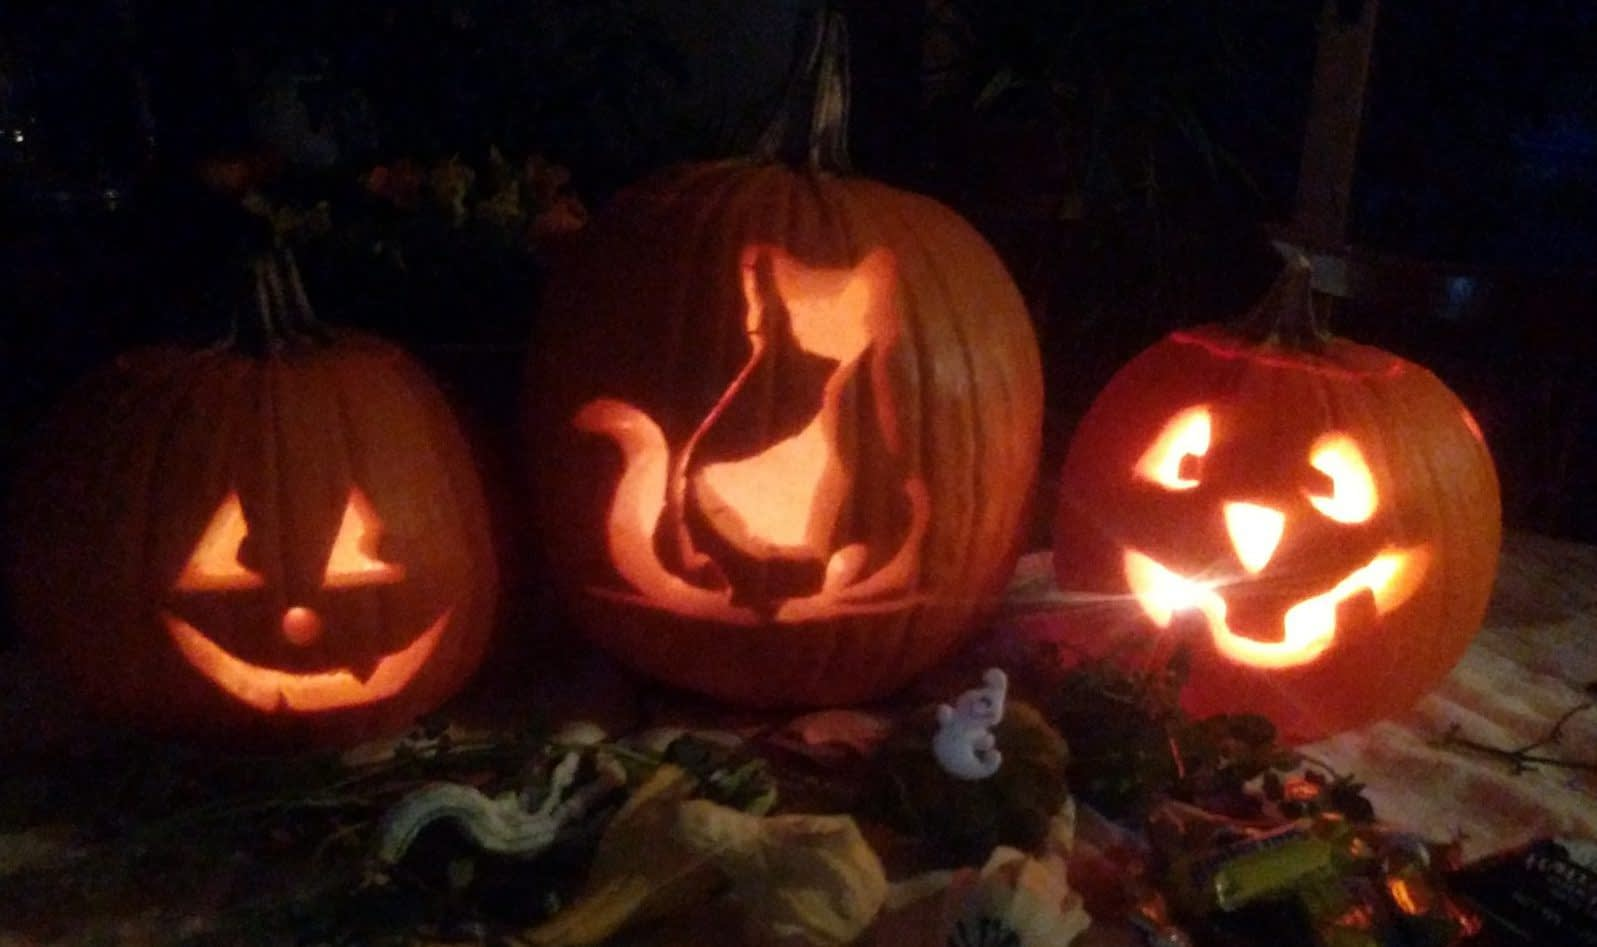 3 lit pumpkins